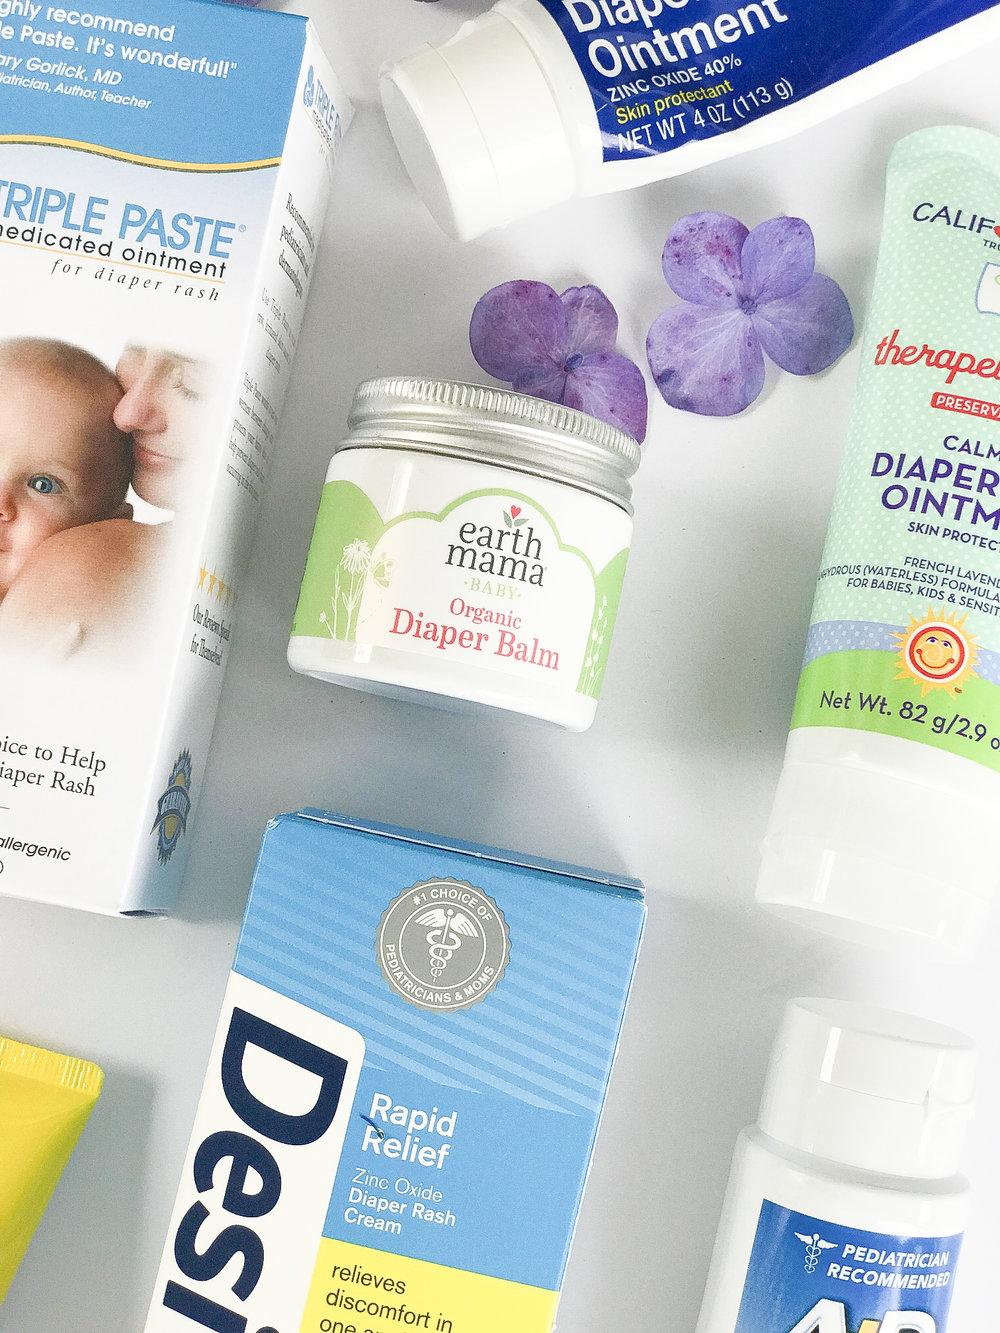 Diaper Rash Creams | Tips for avoiding diaper rash | avoiding diaper rash